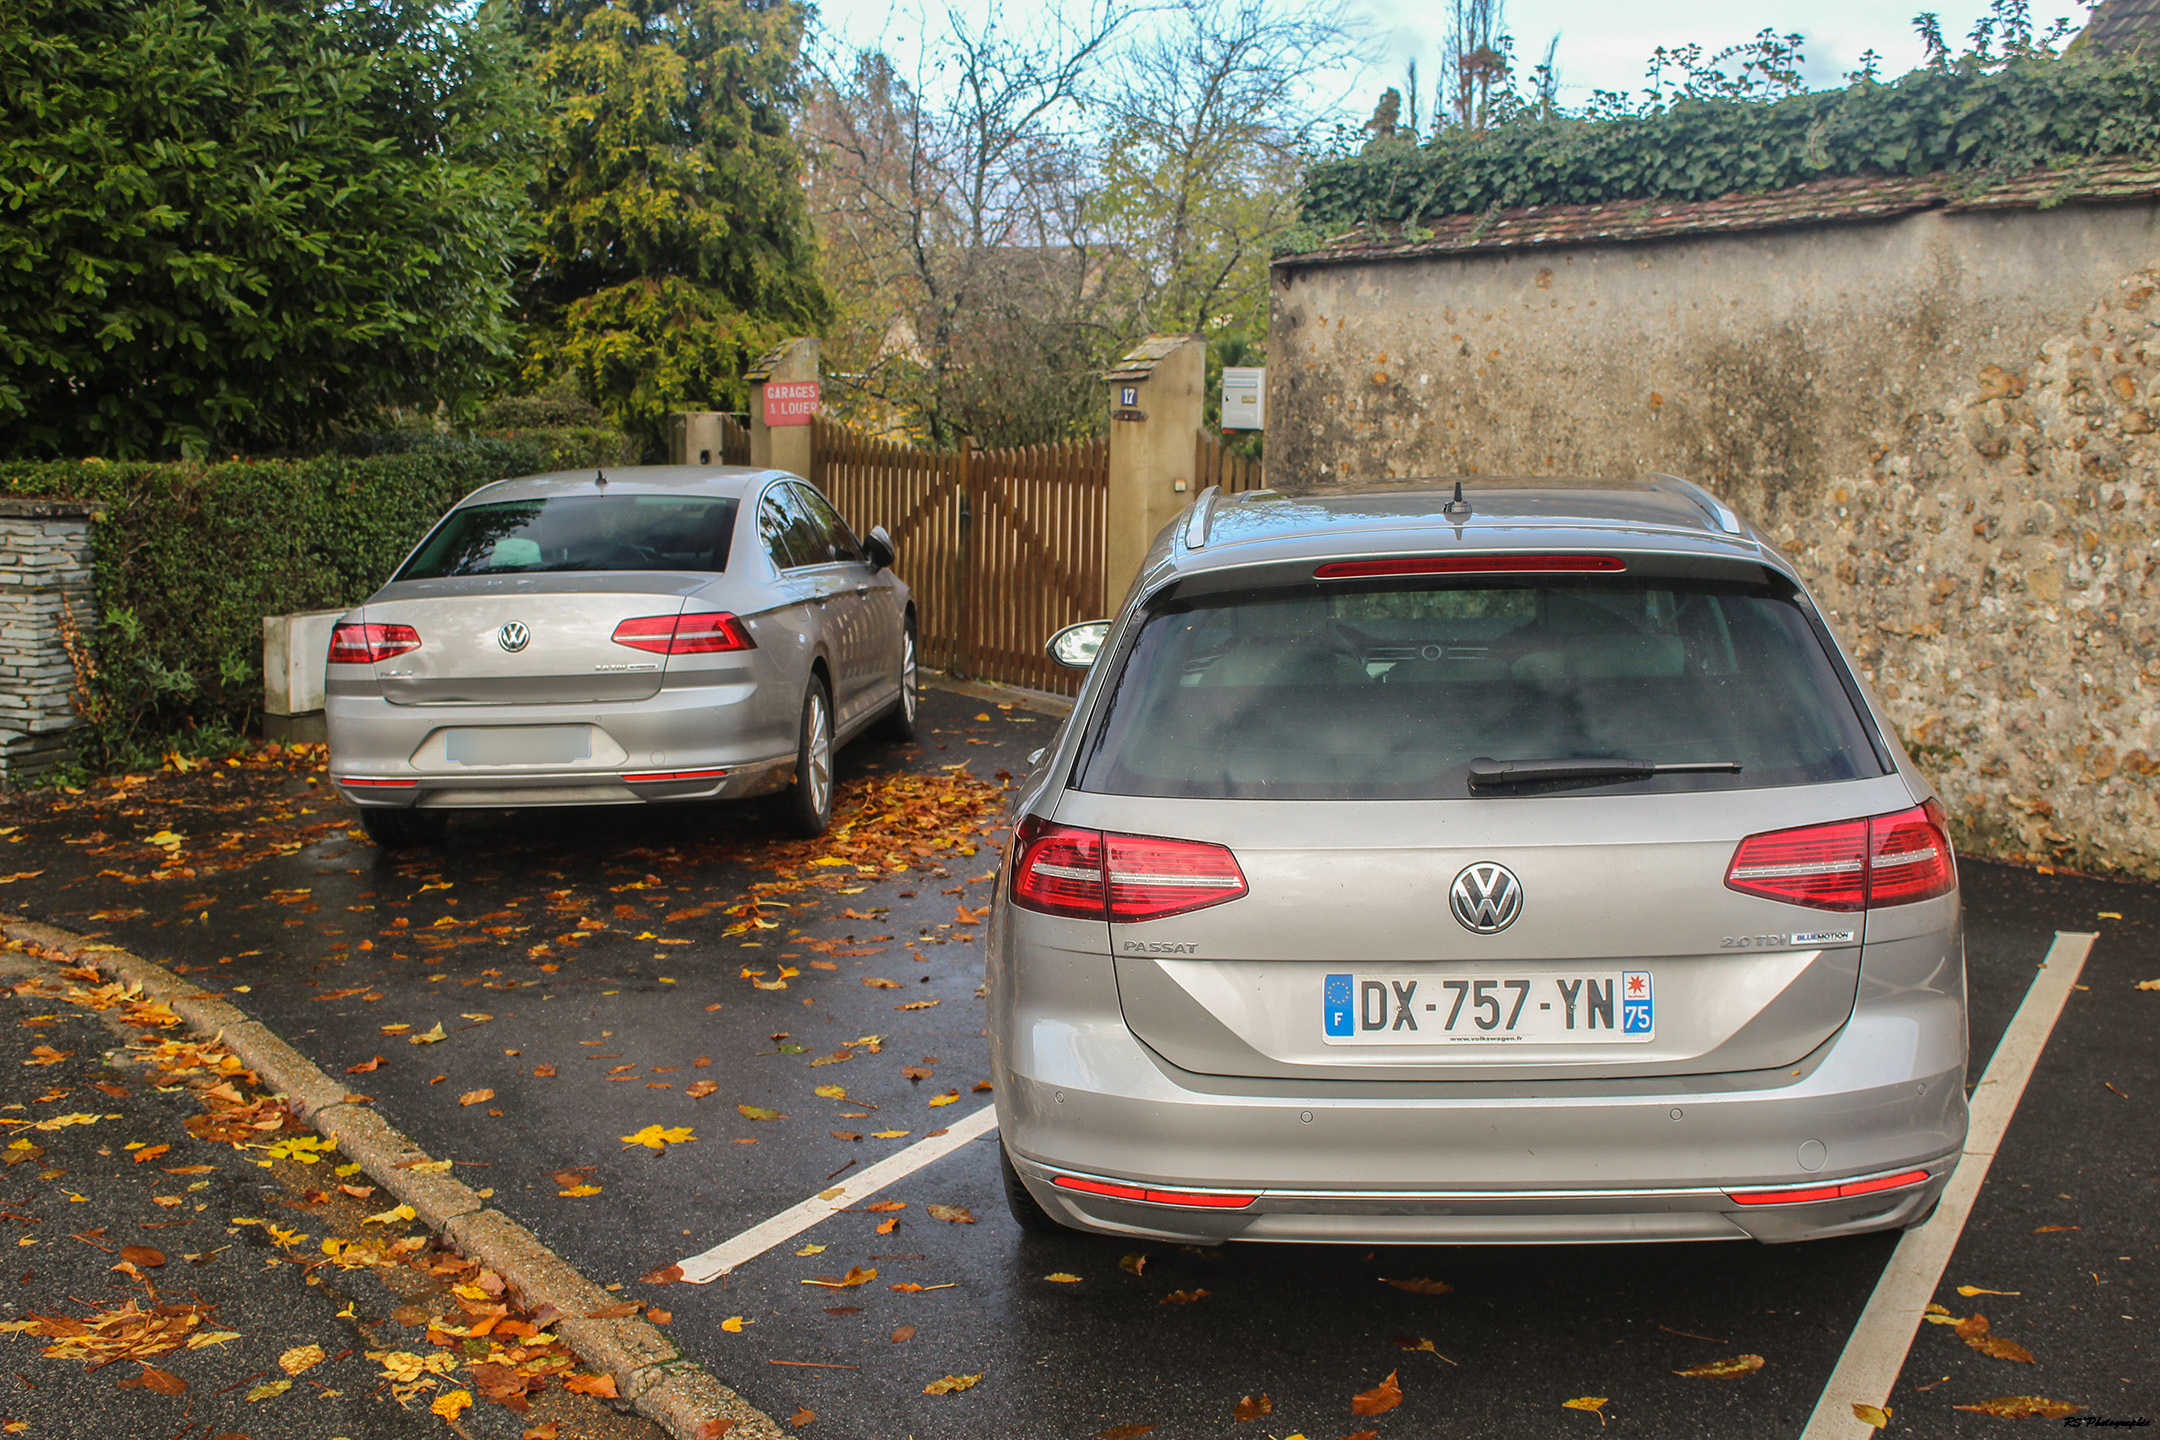 vwpassatsw44-volkswagen-passat-sw-arriere-rear-arnaud-demasier-rsphotographie